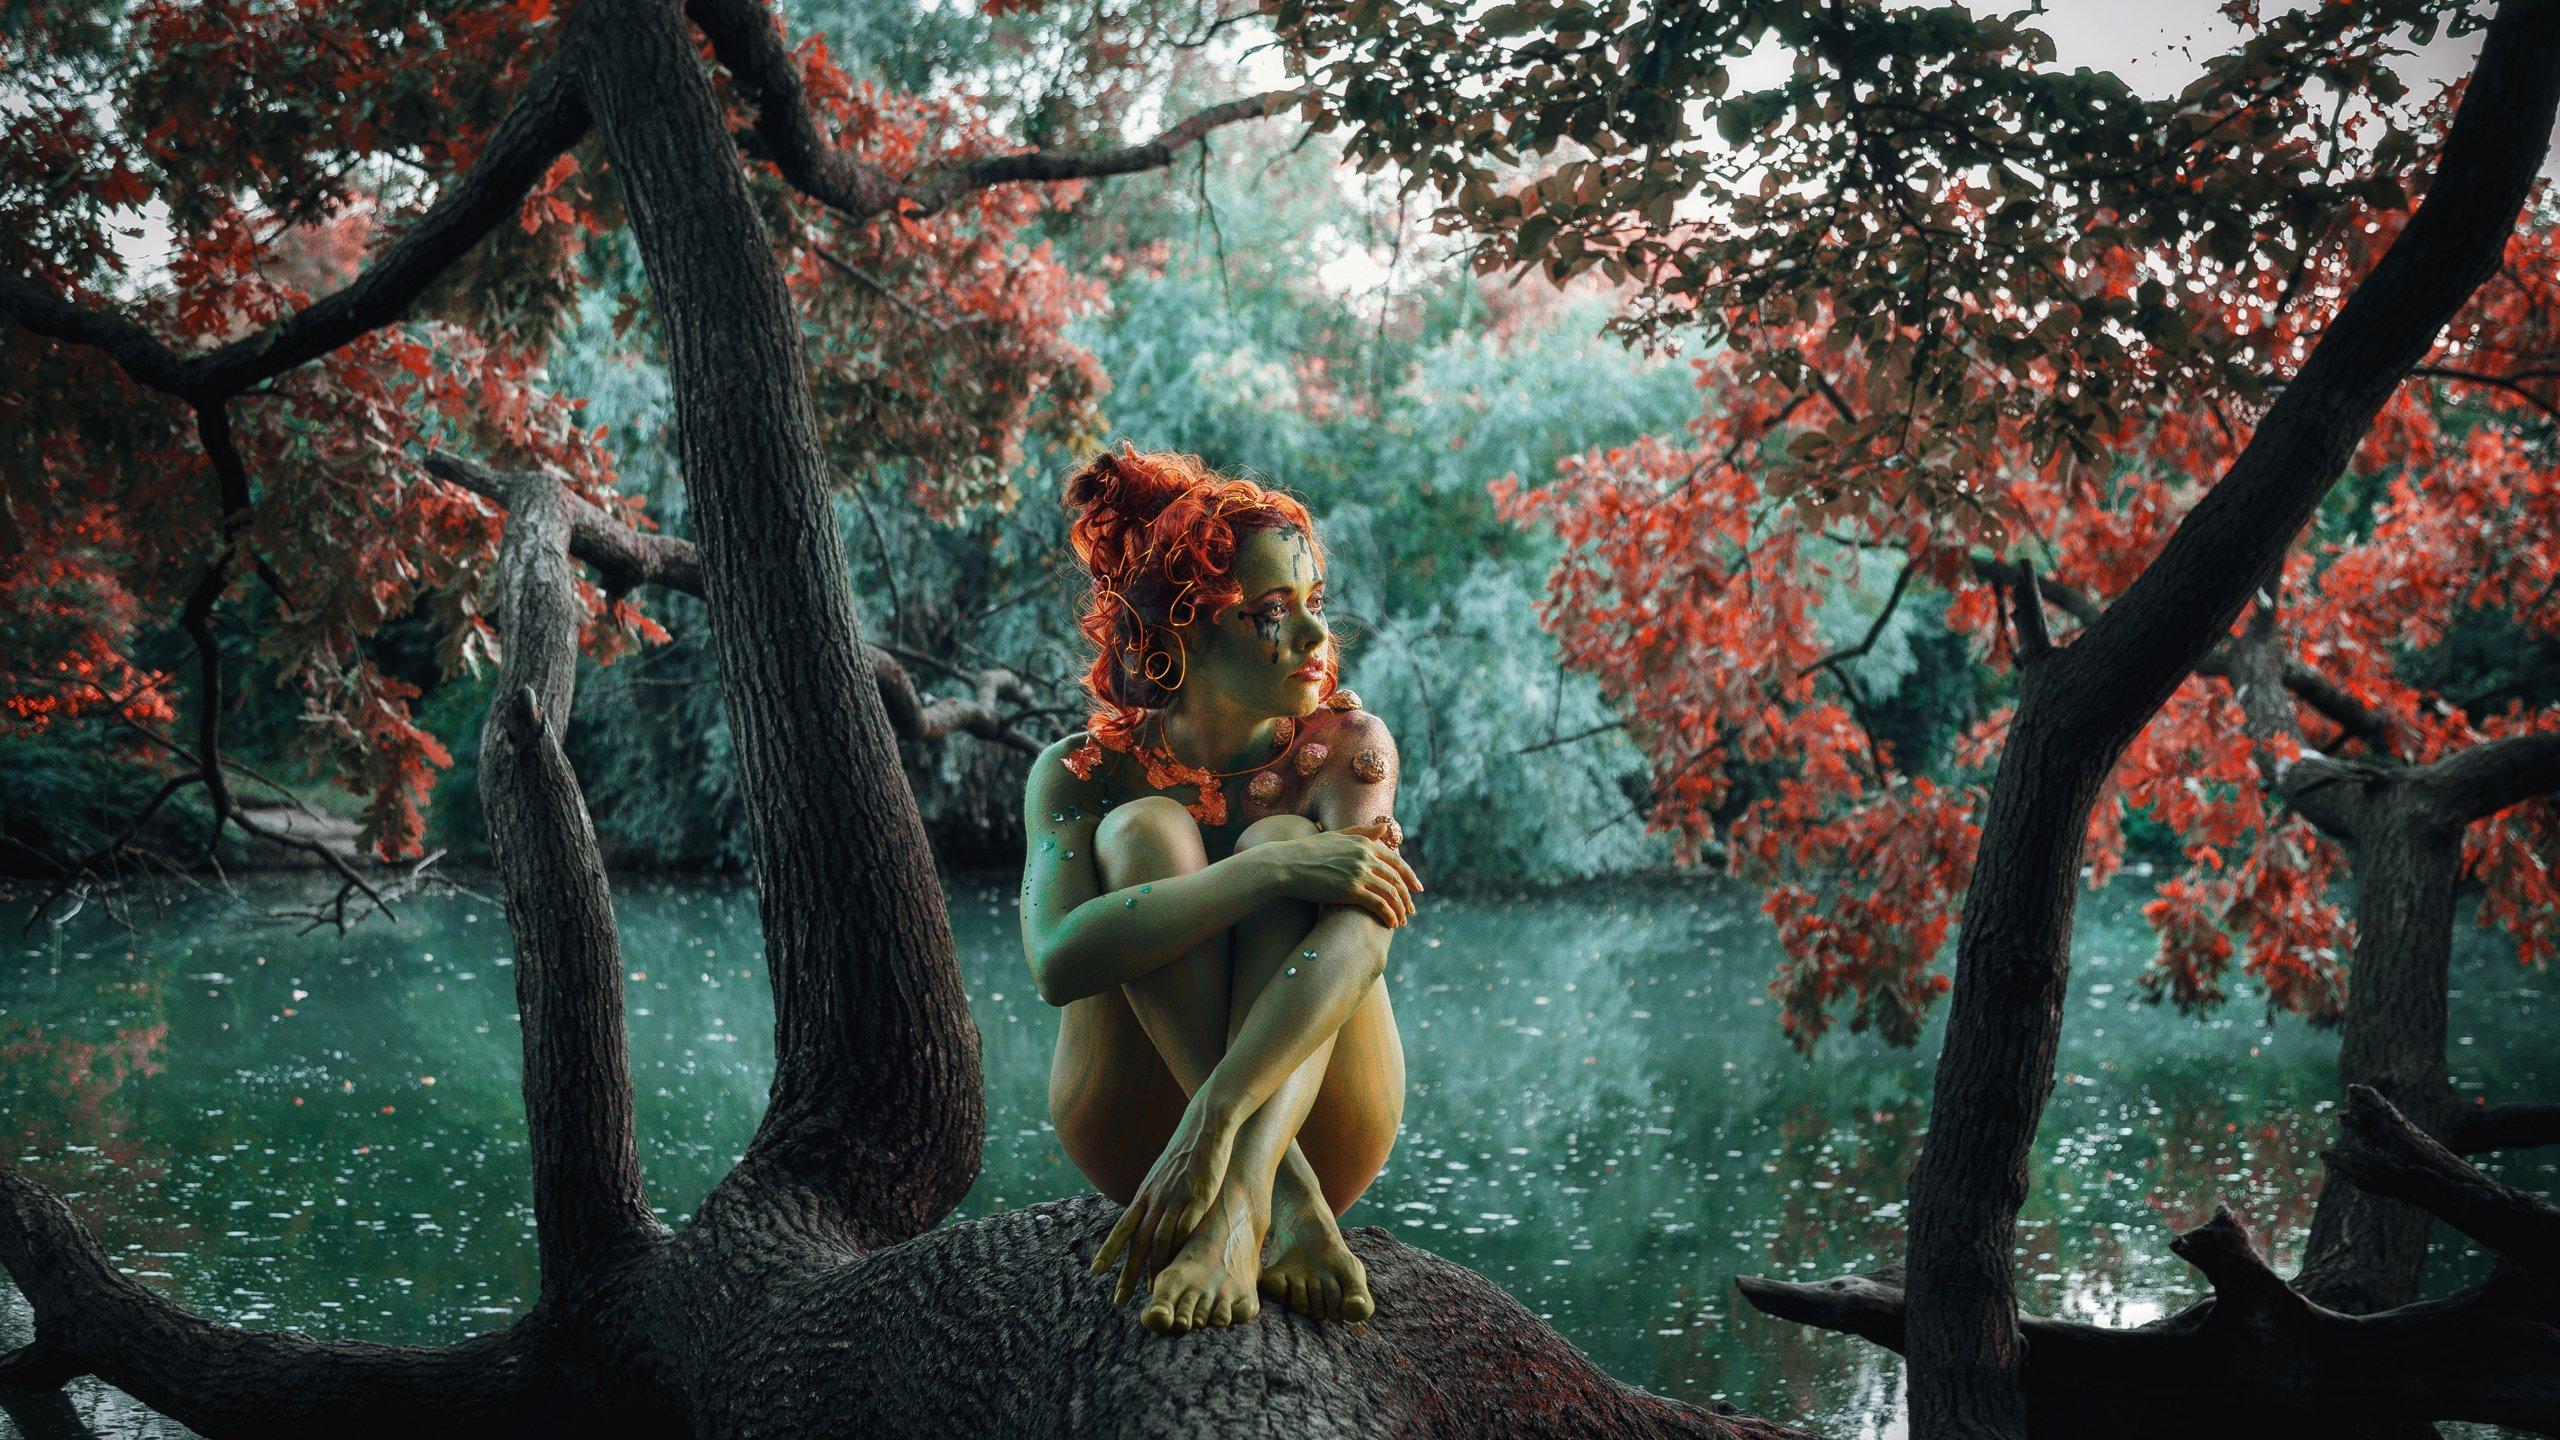 girl, model, nymph, fairy tale, fantasy, body painting, red, mermaid, forest, river, russia, девушка, модель, нимфа, сказка, фентези, бодиарт, рыжая, русалка, лес, река, россия, Васильев Андрей